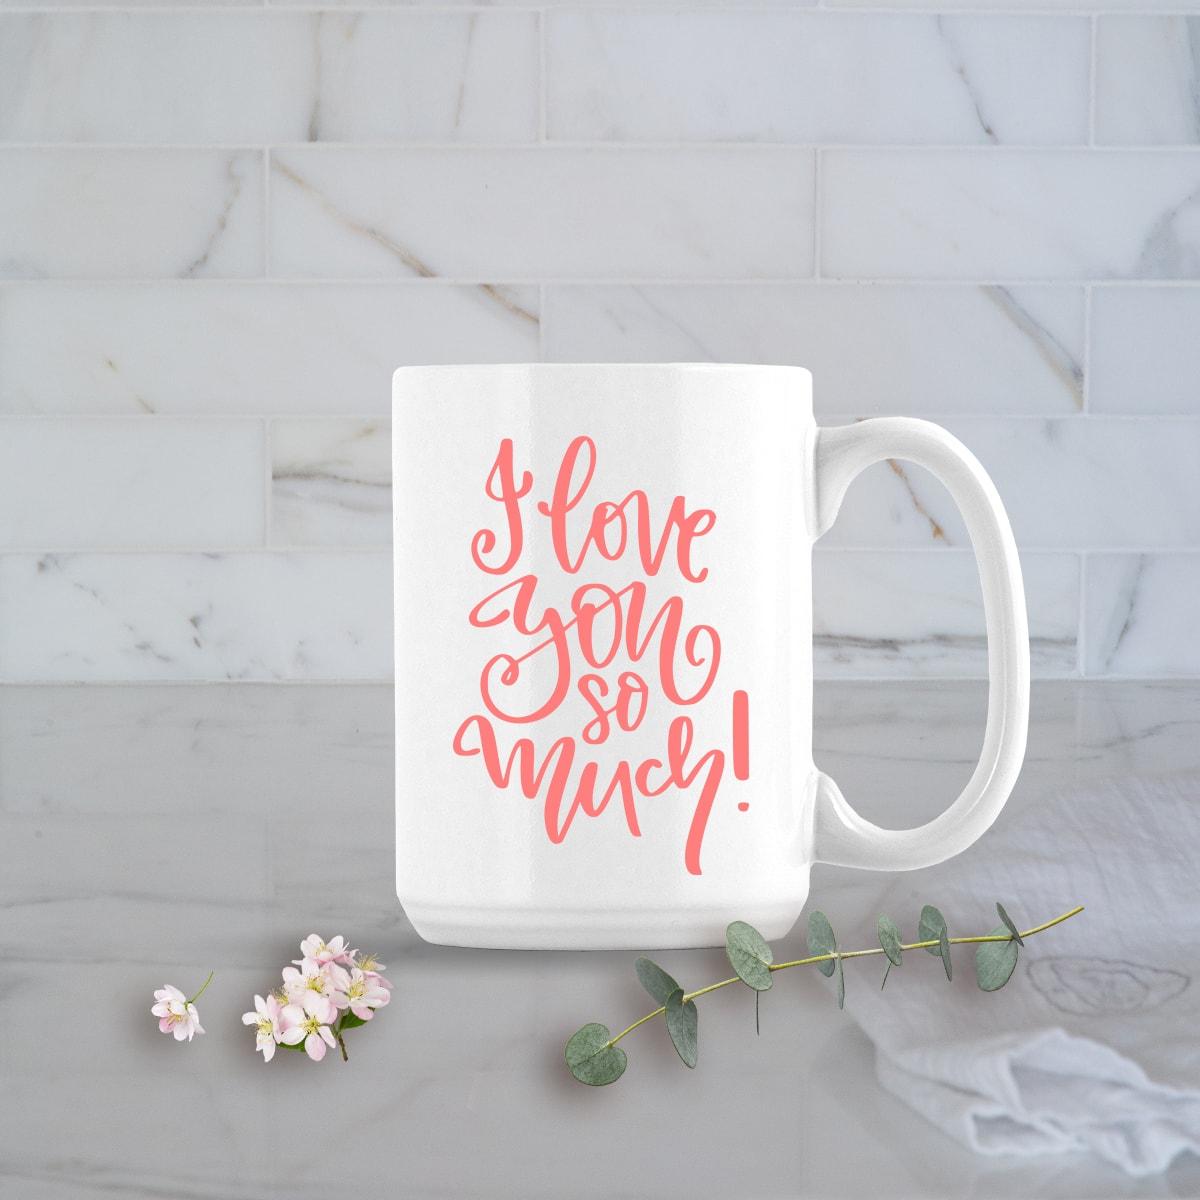 Valentines Day Gifts 15oz I Love You So Much Mug